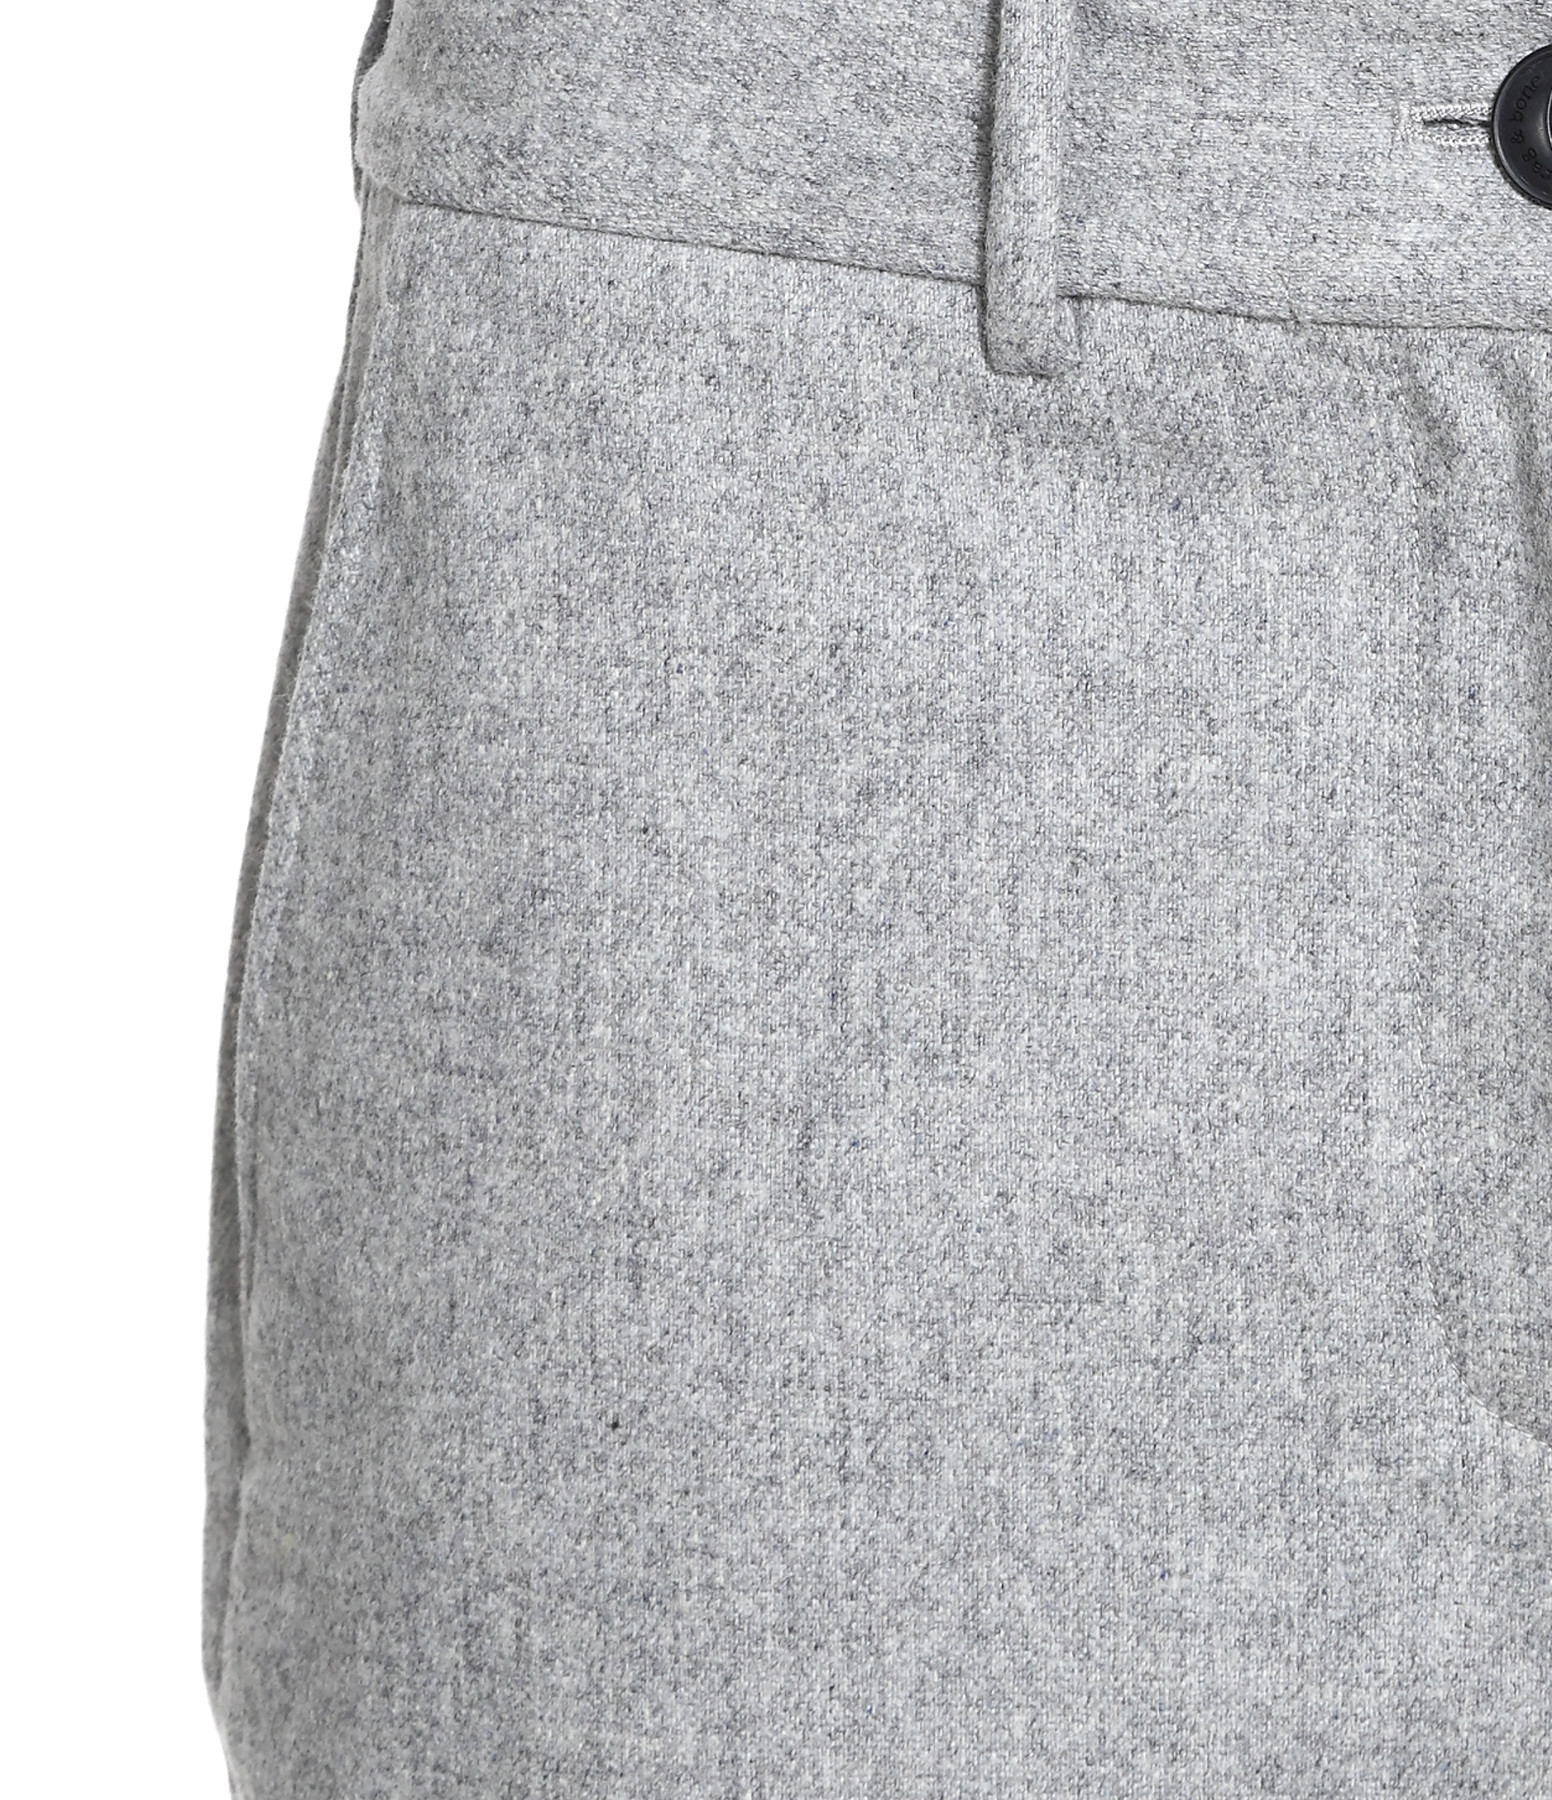 RAG & BONE - Pantalon Libby Laine Gris